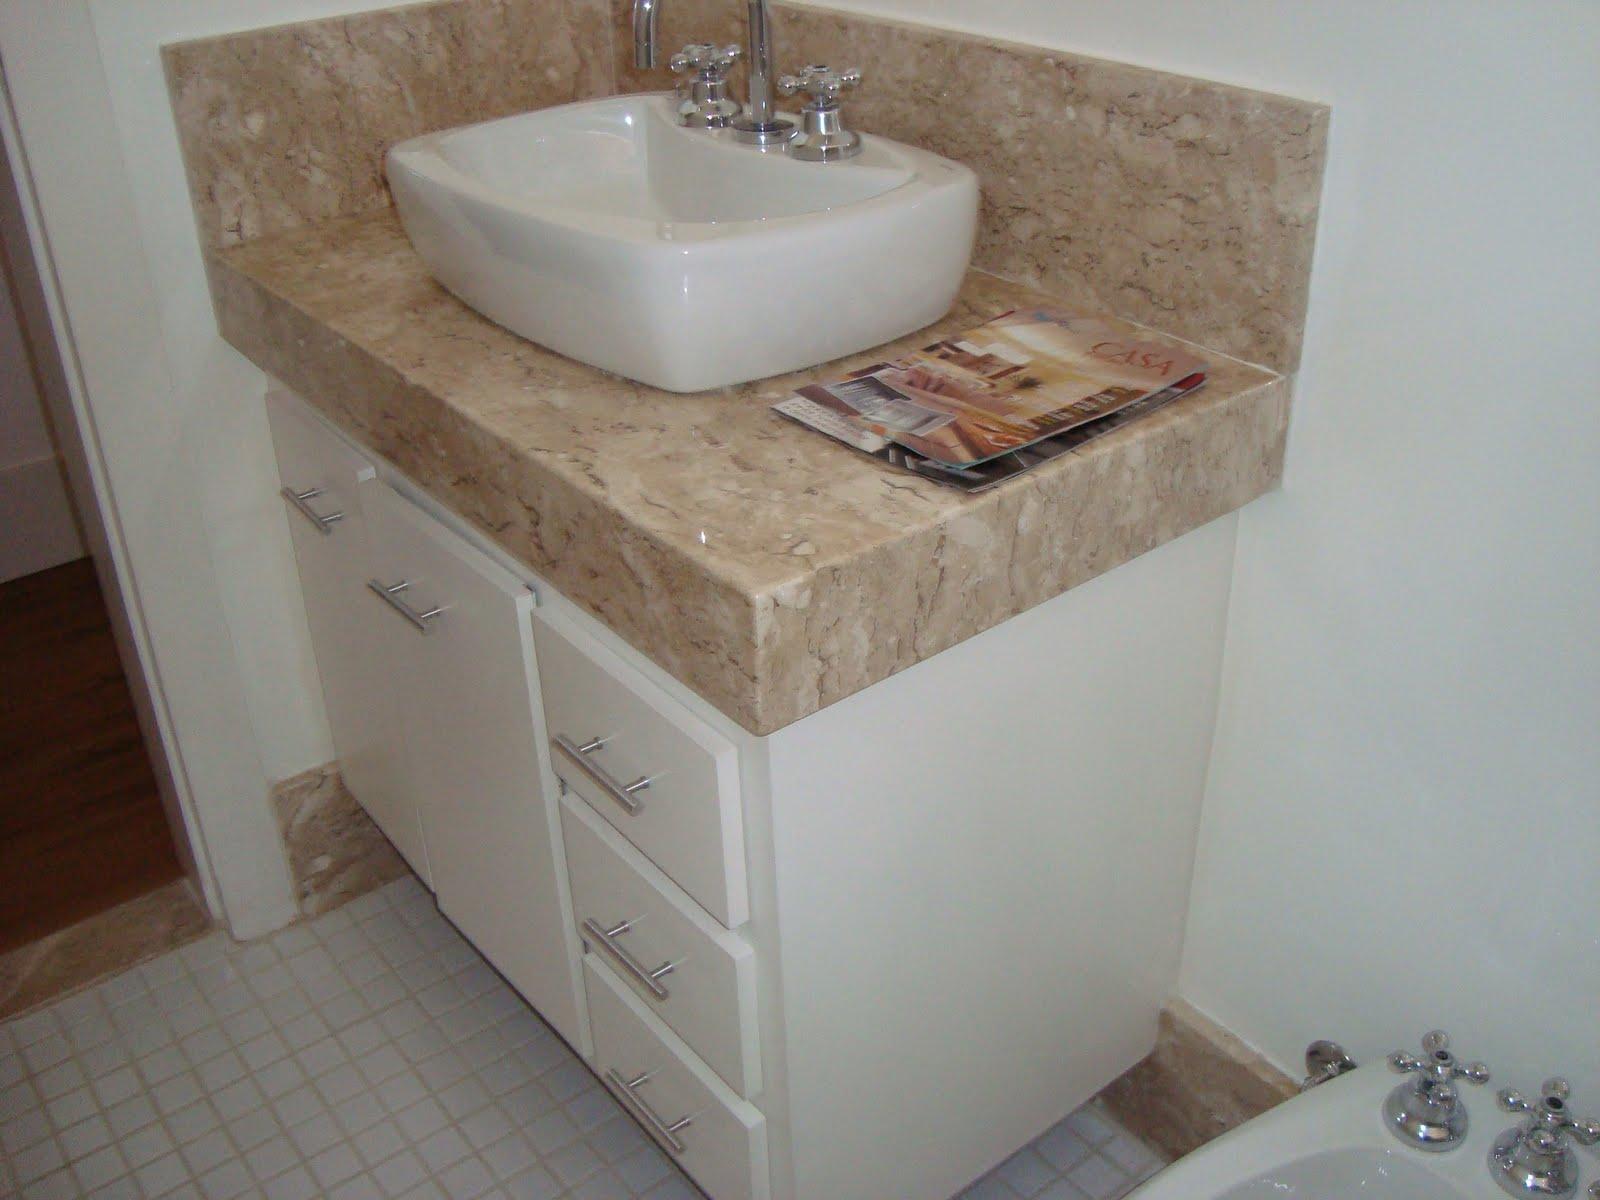 Marmoraria Granart: Bancadas Mármore Branco Clássico e Travertino. #3B2820 1600x1200 Bancada Banheiro Marmore Travertino